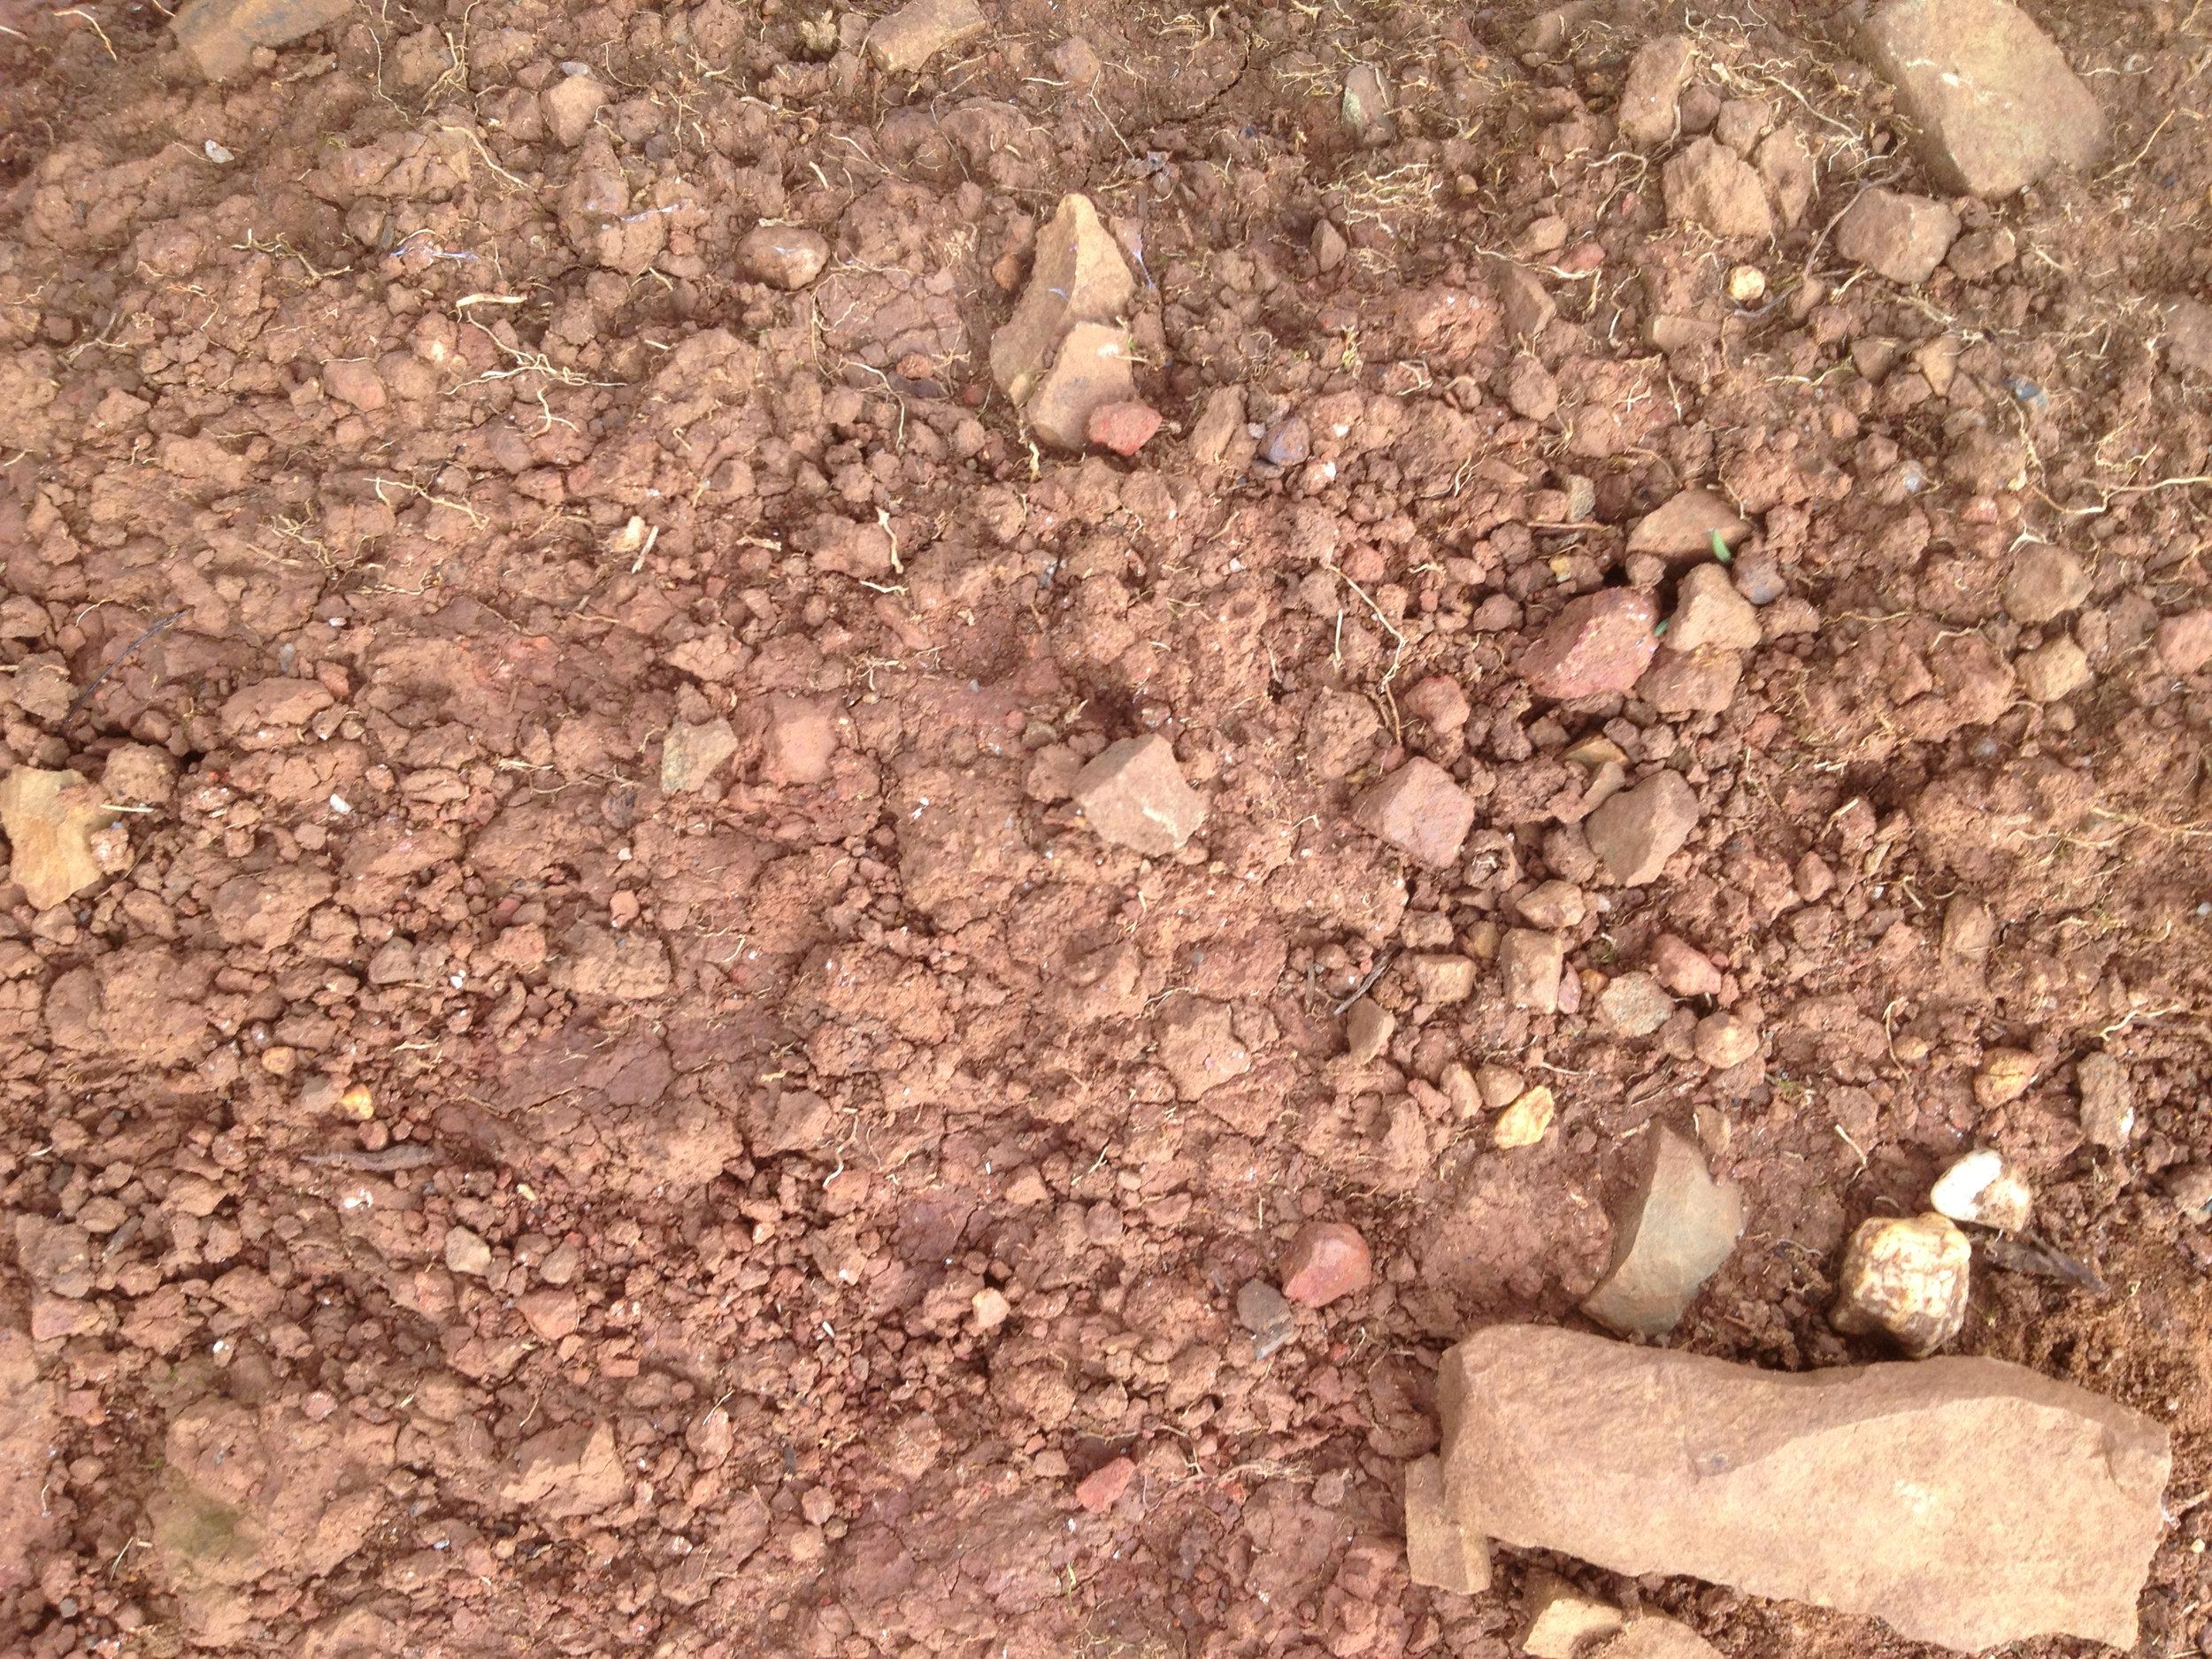 Moondarra soil 2.jpg